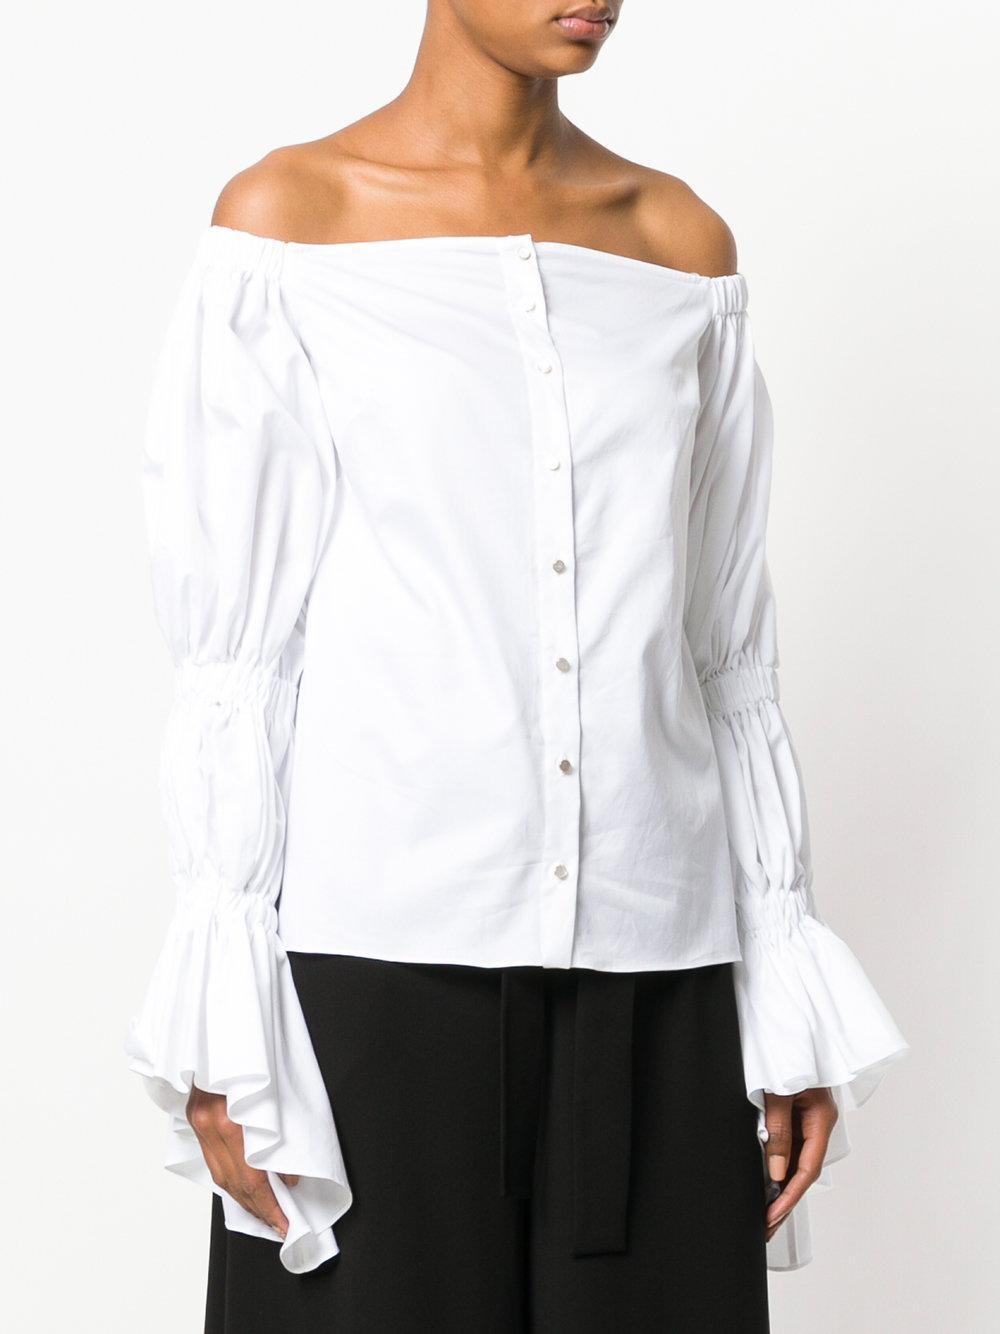 Womens Bianca Tieneck Cotton Twill Blouse Osman 2018 Newest Cheap Price GuvZ83